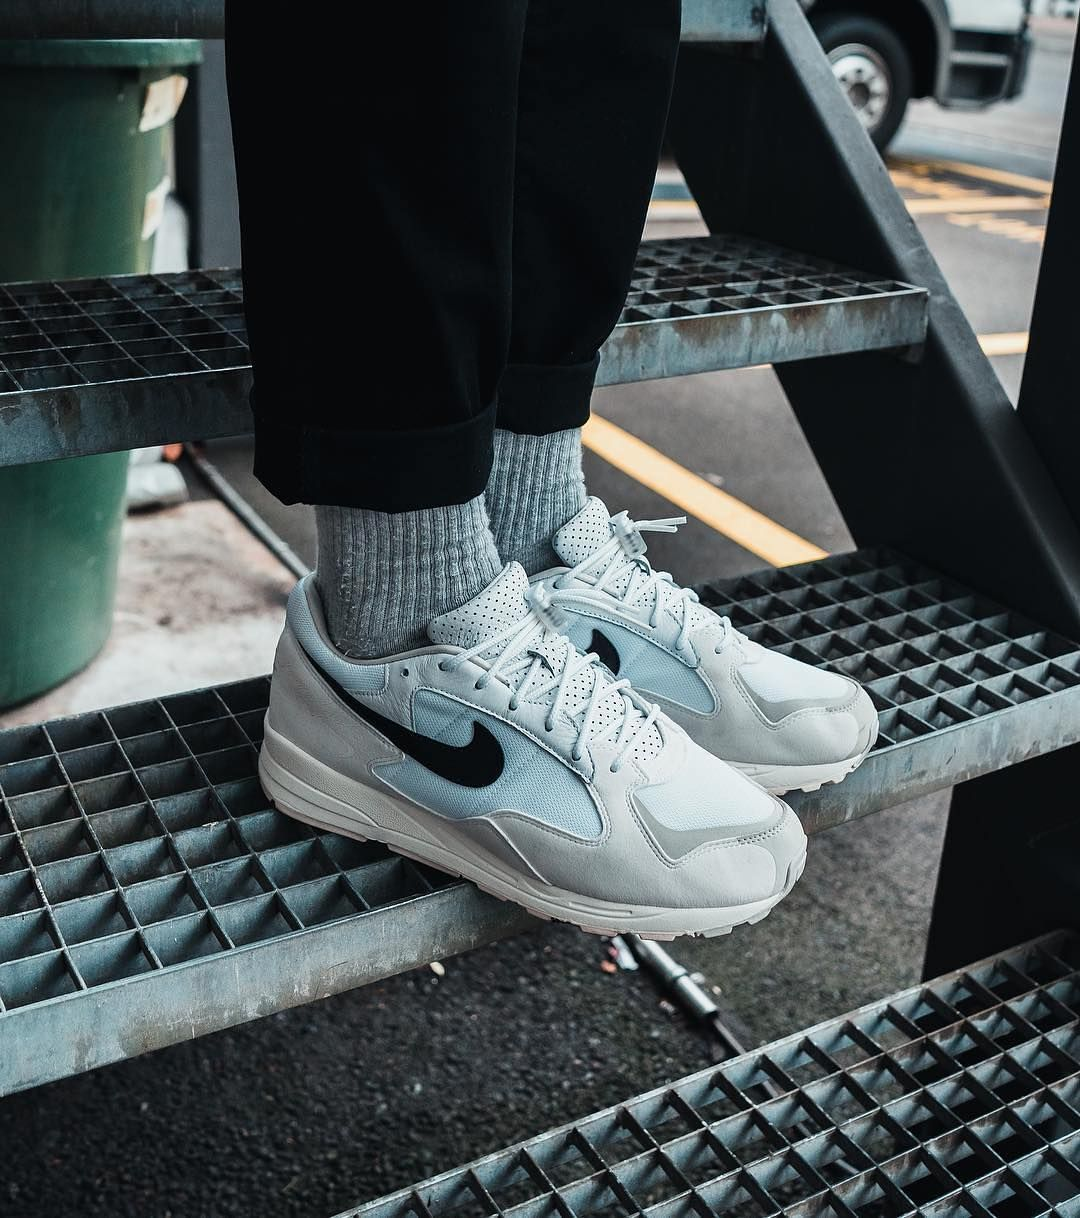 Sneaker posters, Sneakers, Air max sneakers